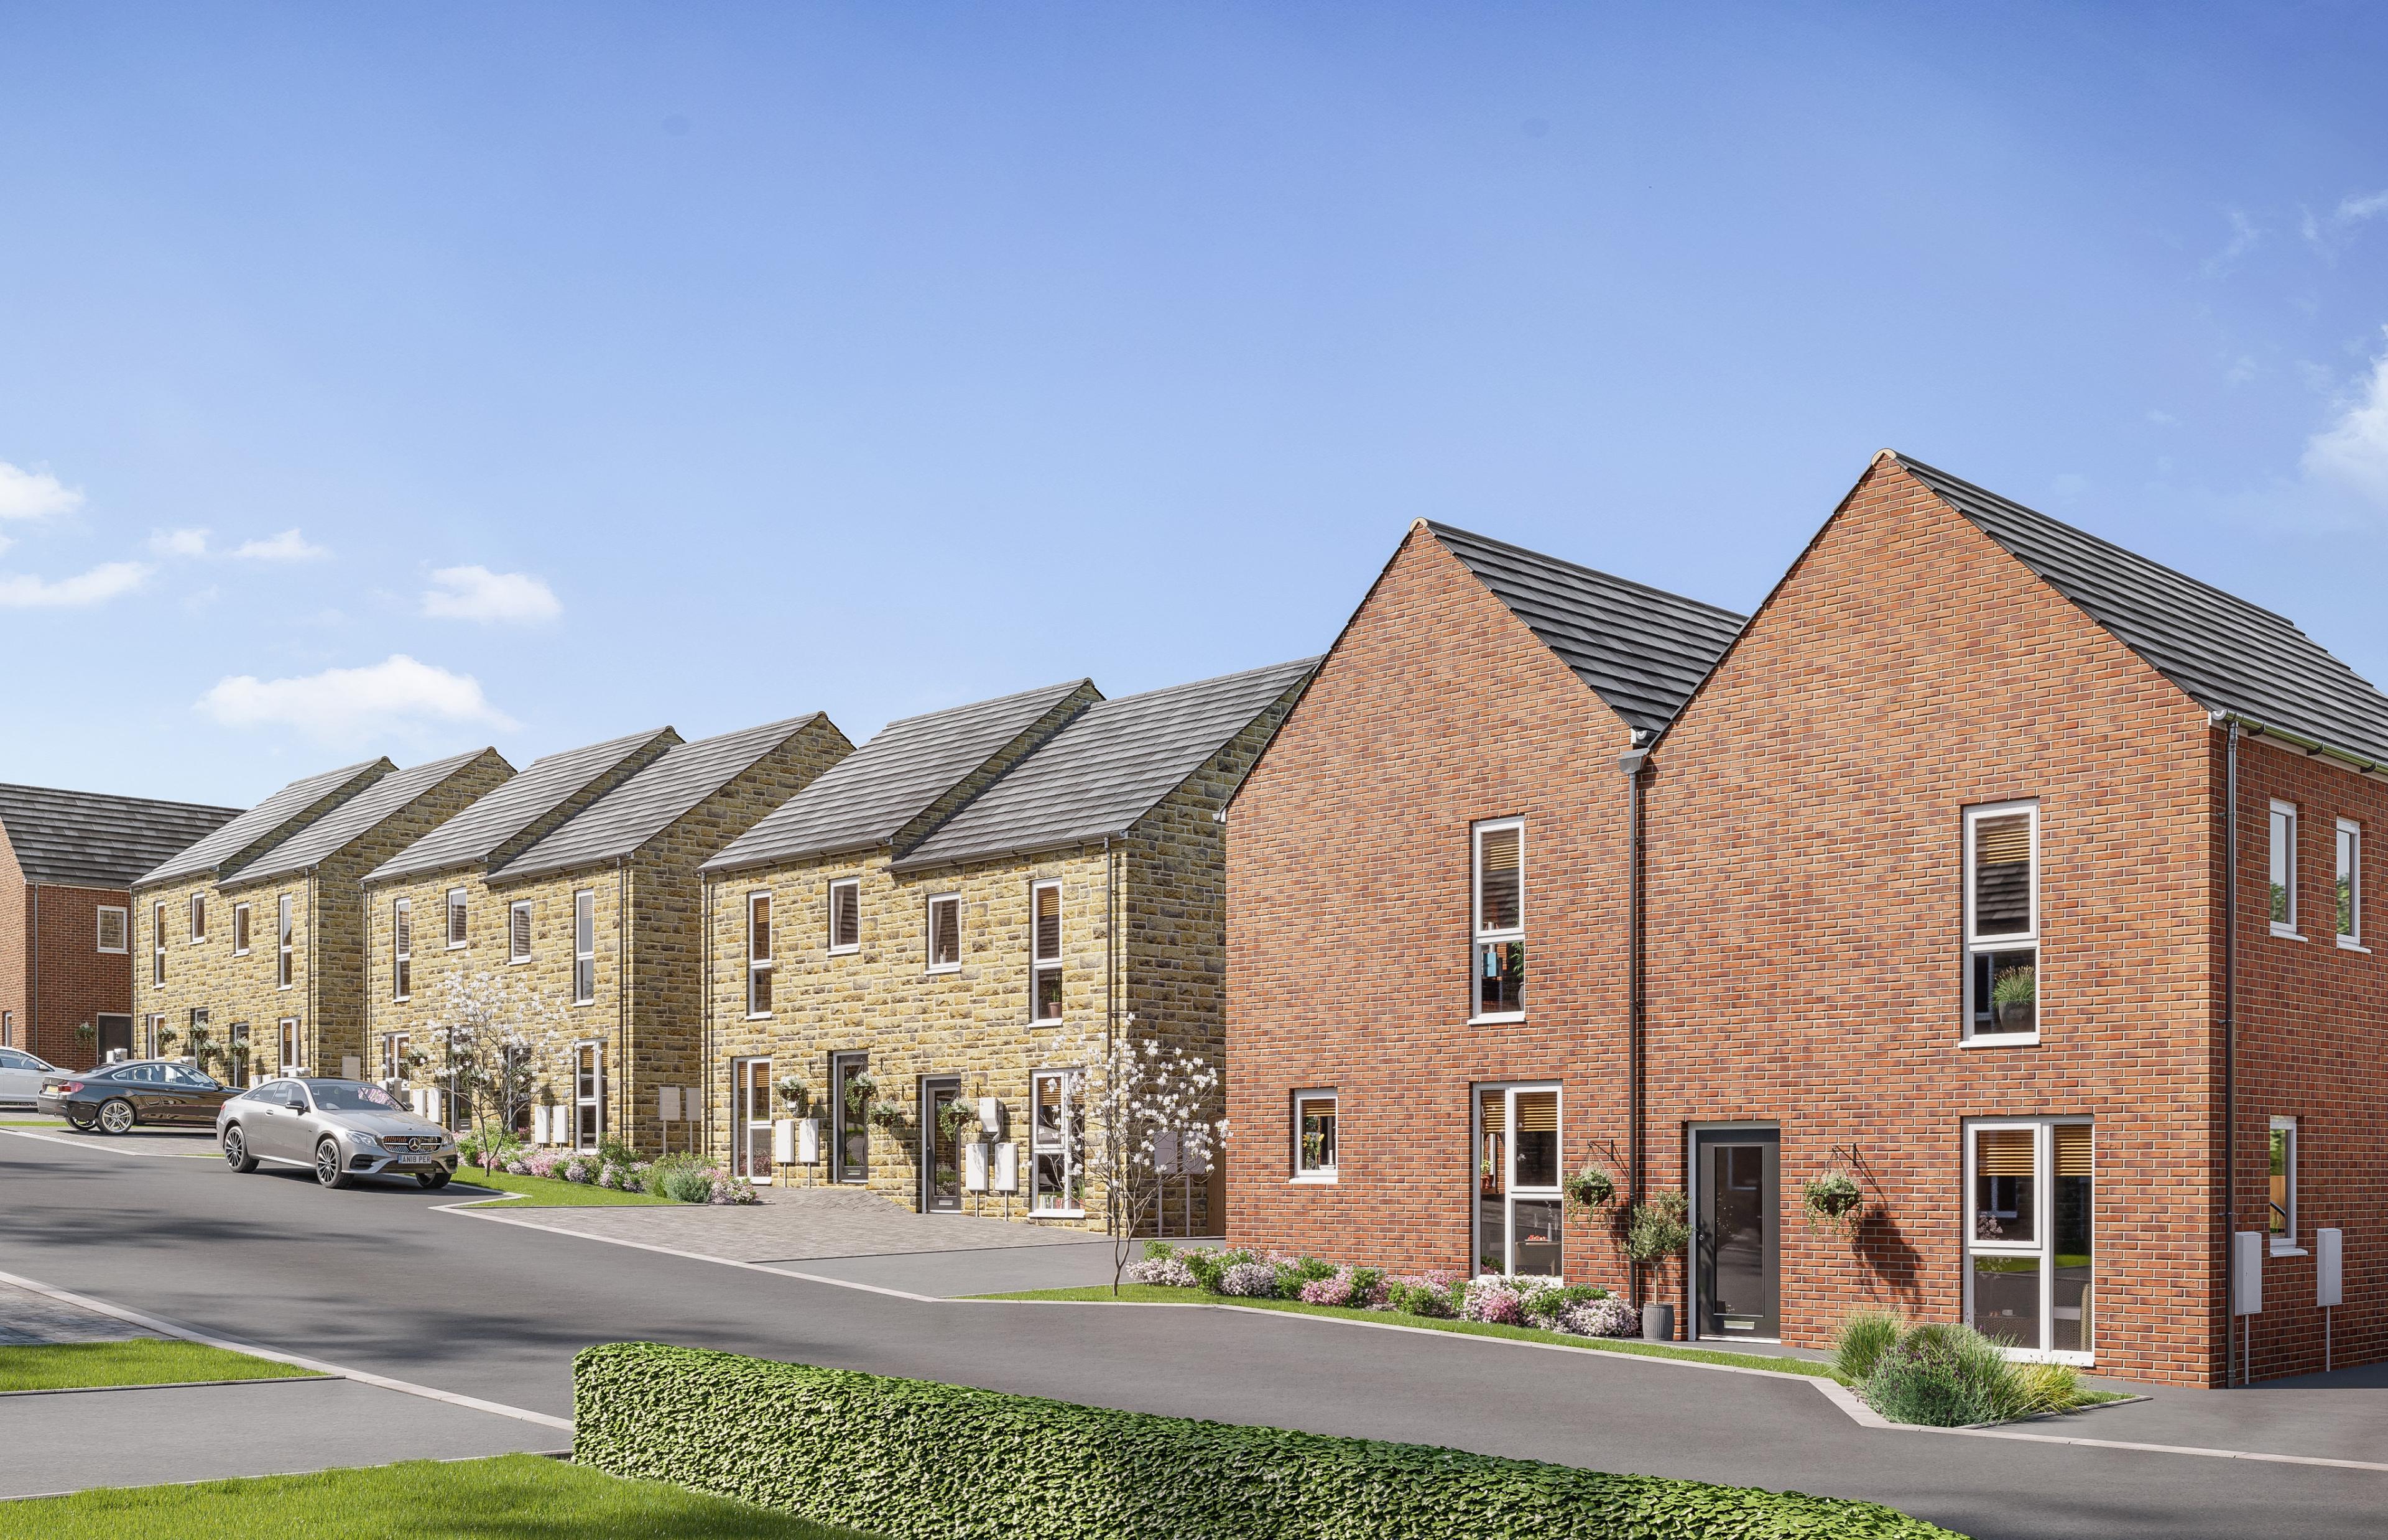 Millstone View - StreetScene-Chellow Grange-Bradford-Plots16-29